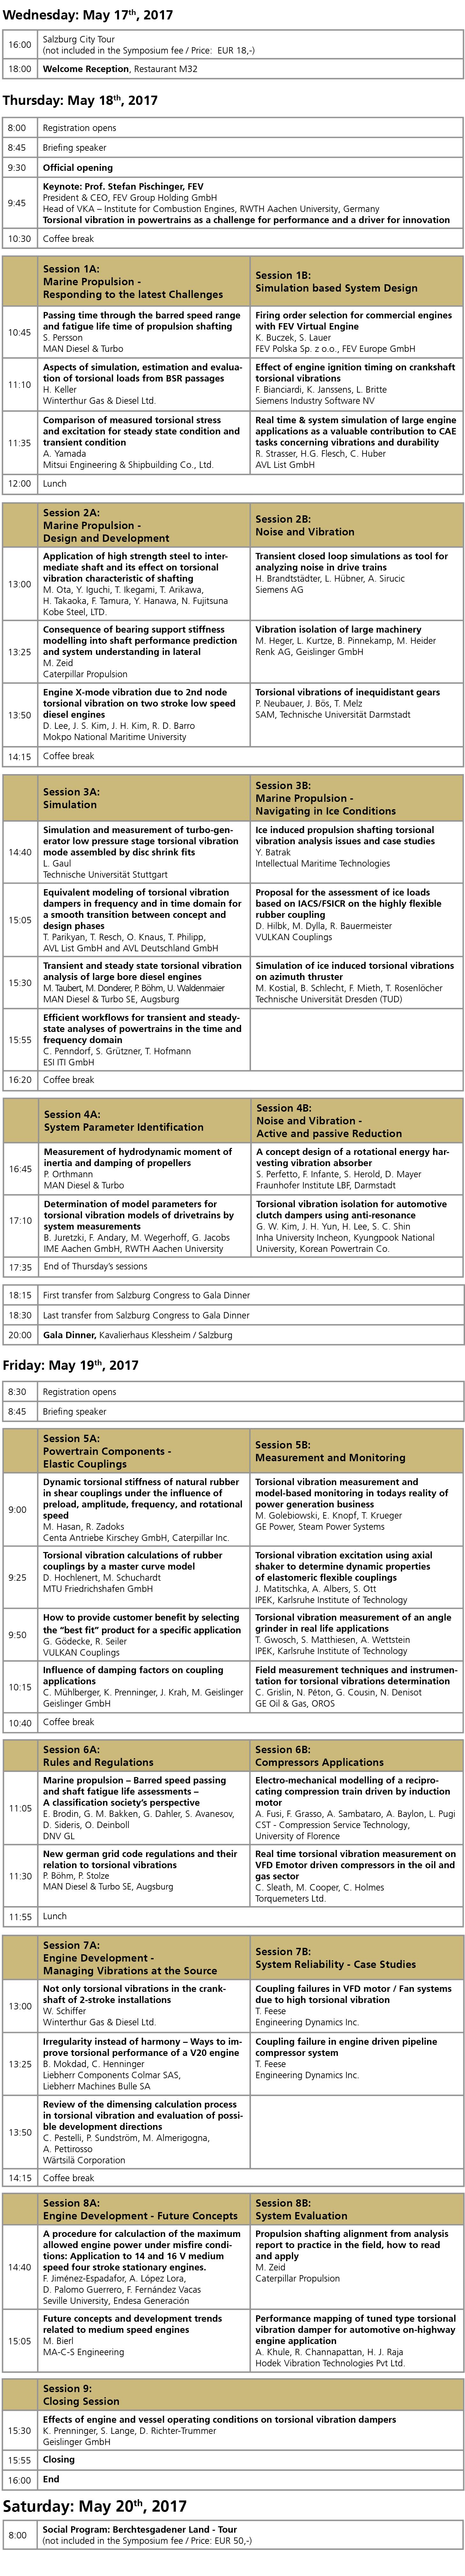 Program_TVS2017_April 2017